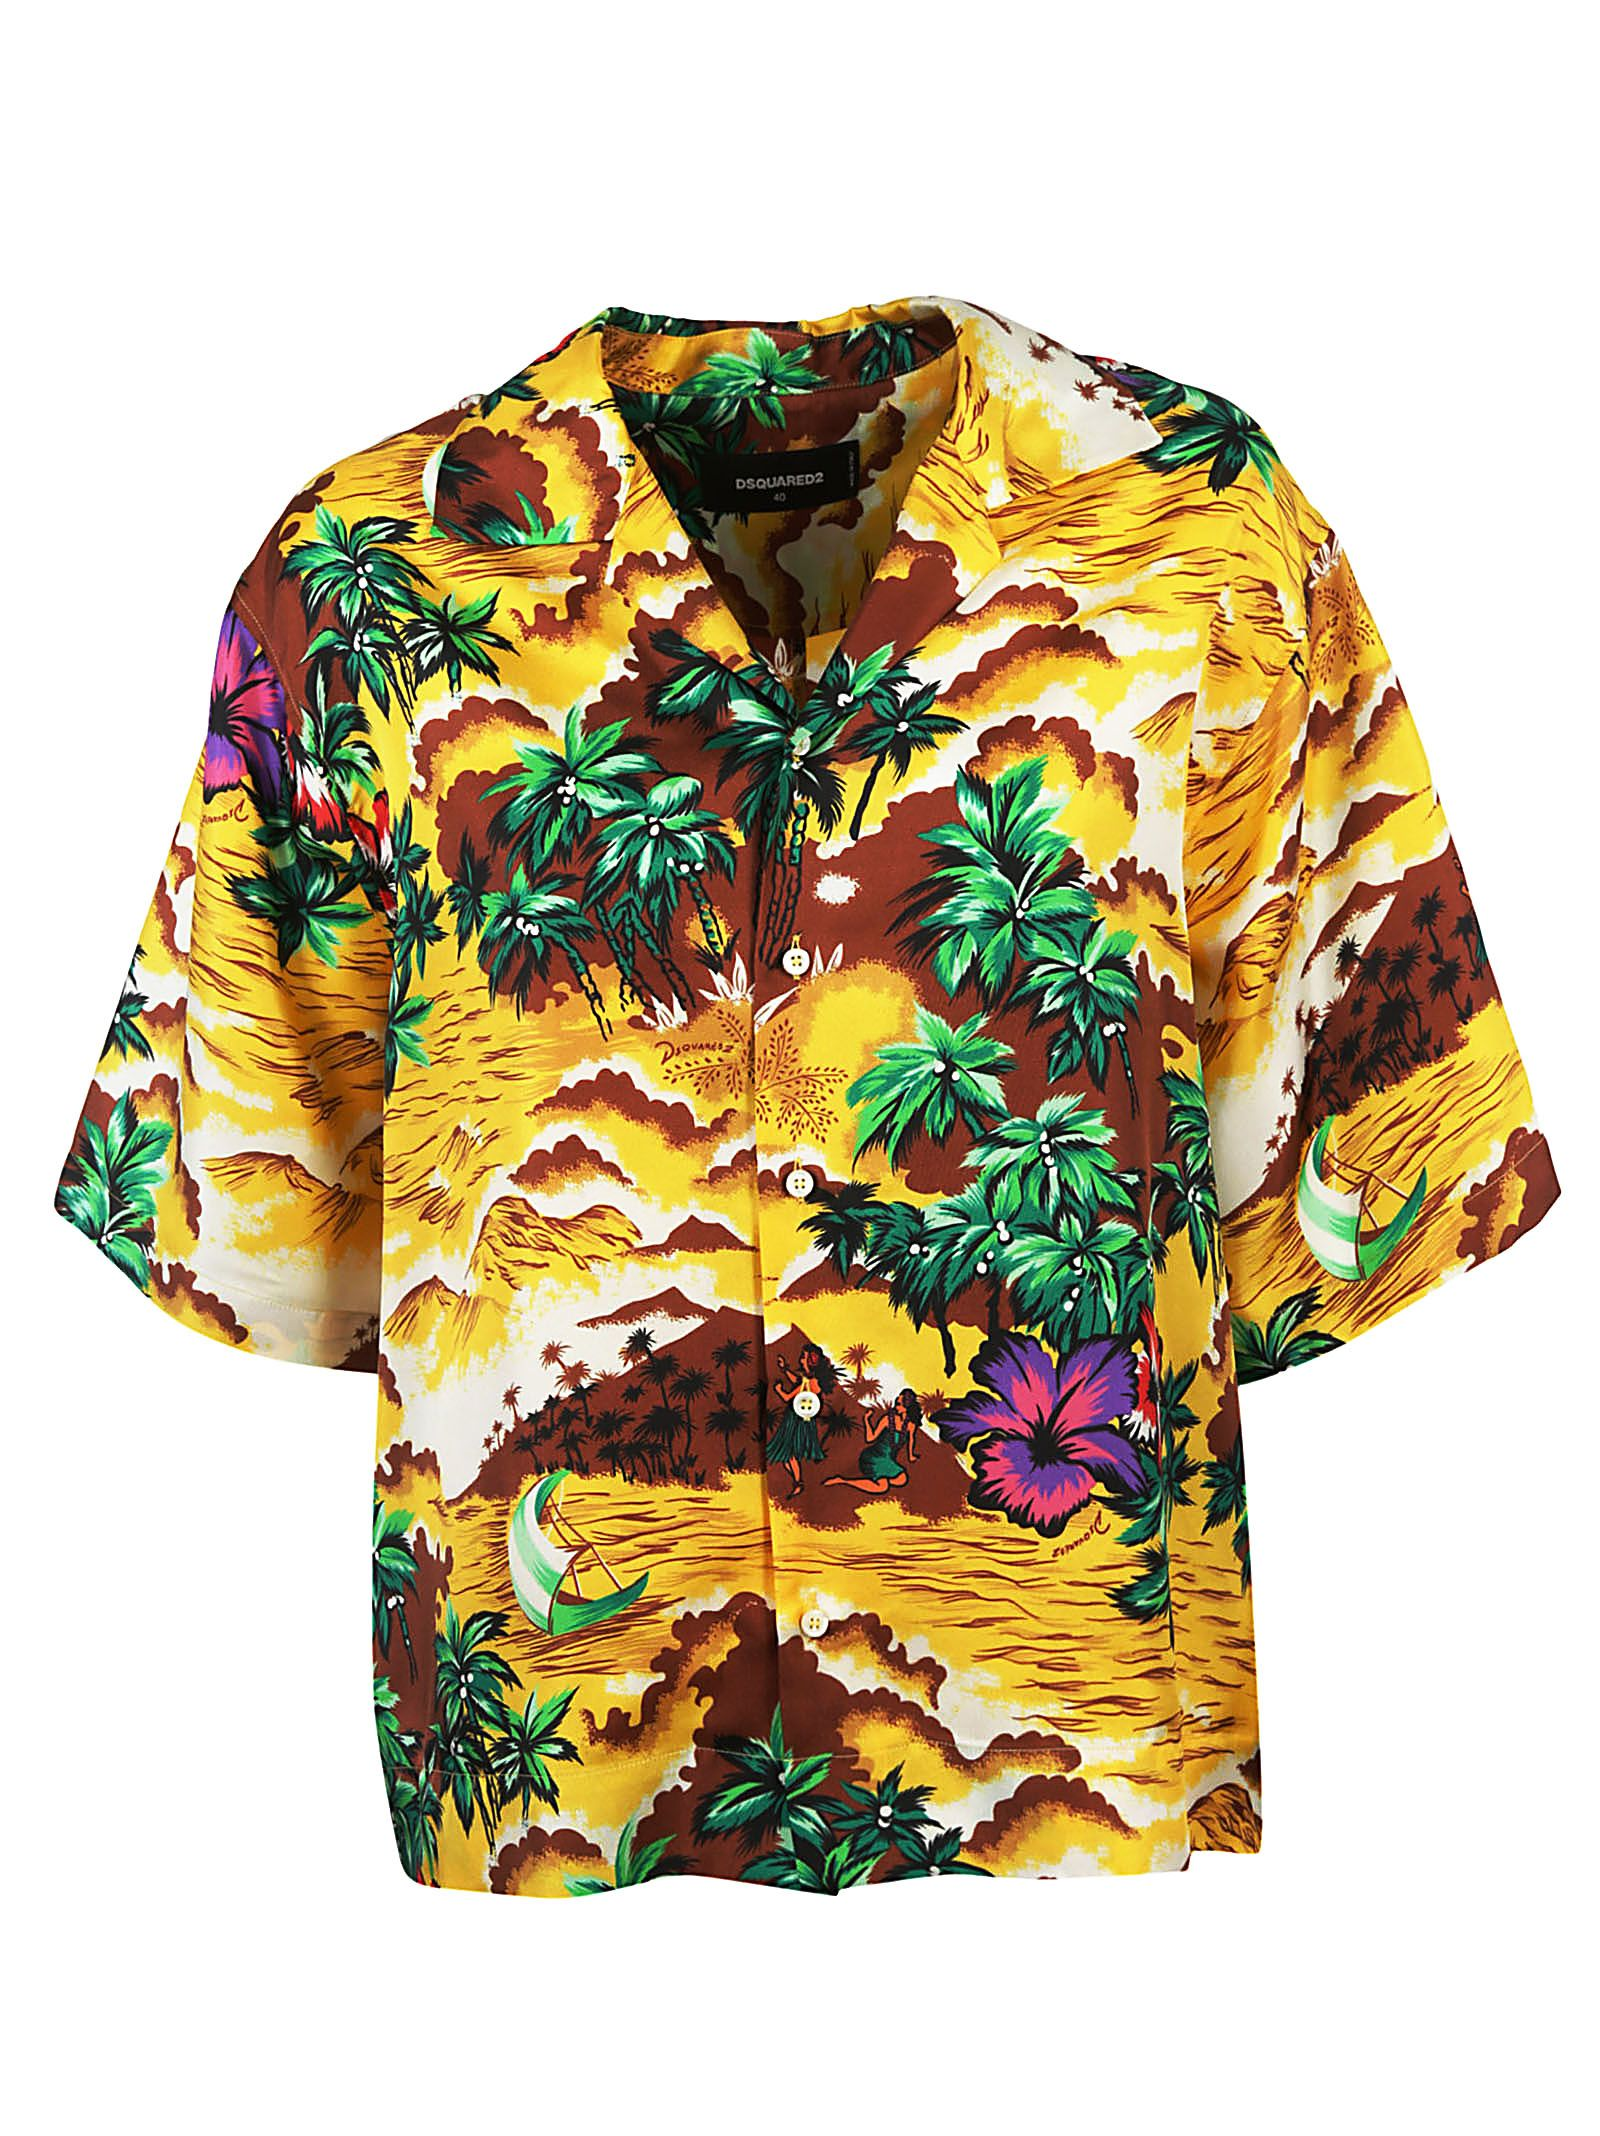 f63c8acb7 Dsquared2 DSquared2 Hawaiian Printed Shirt - Multicolor - 10570066 ...